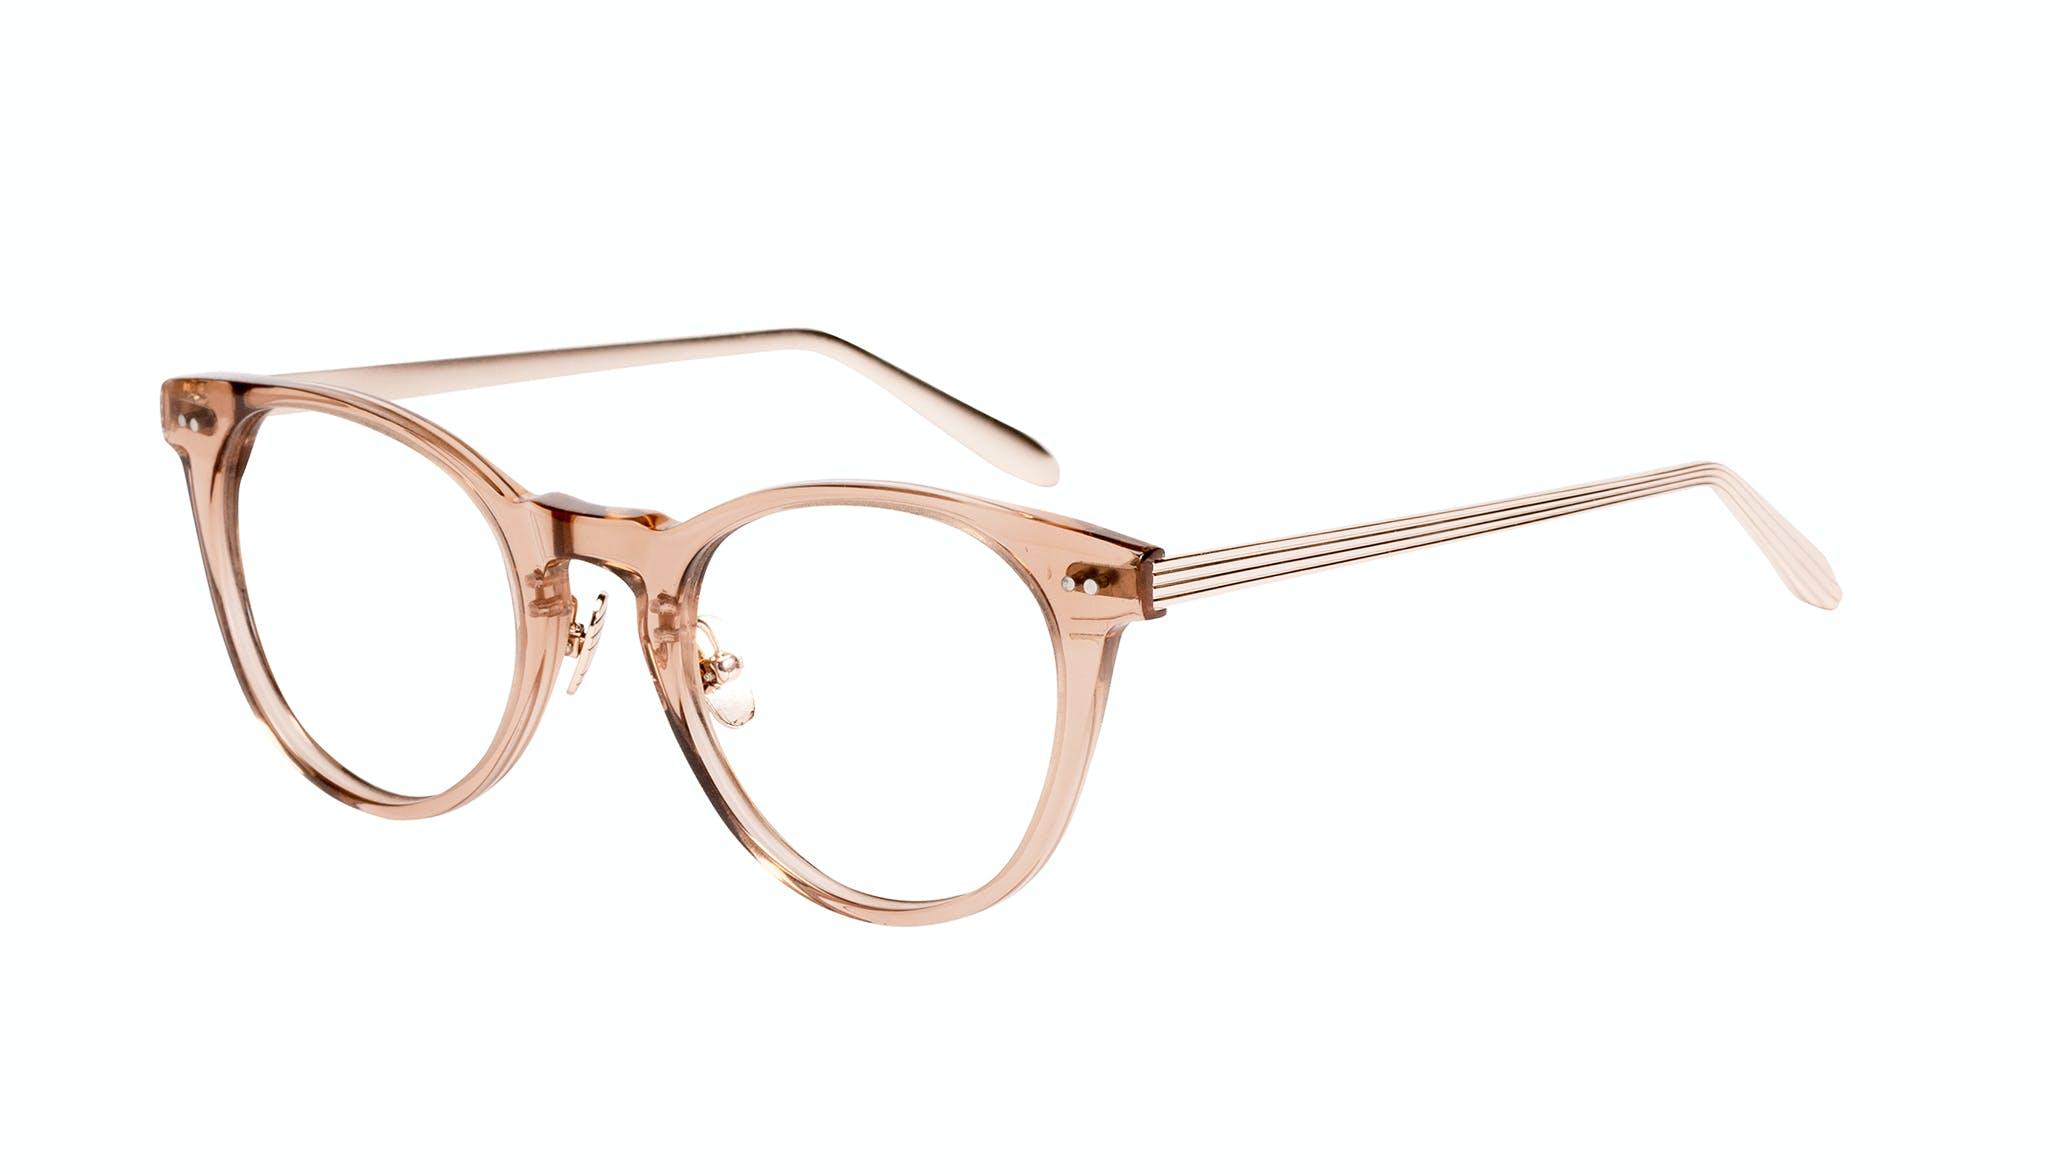 Affordable Fashion Glasses Round Eyeglasses Women Luv Rose Tilt